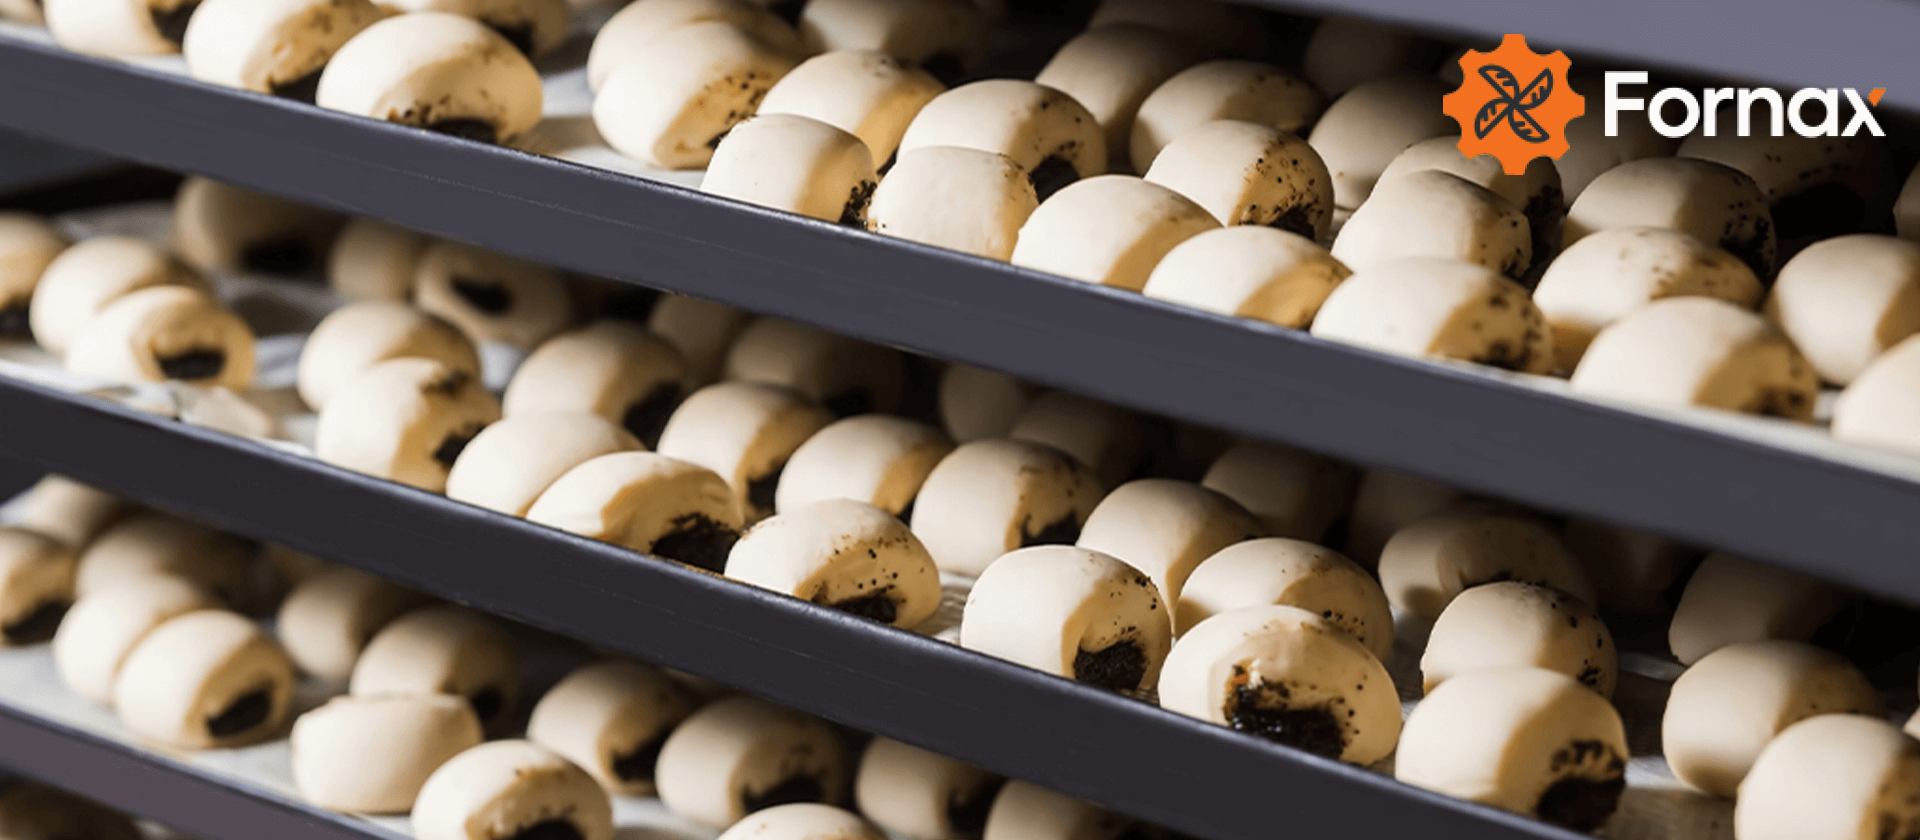 retarder proofer bakery pastry equipment